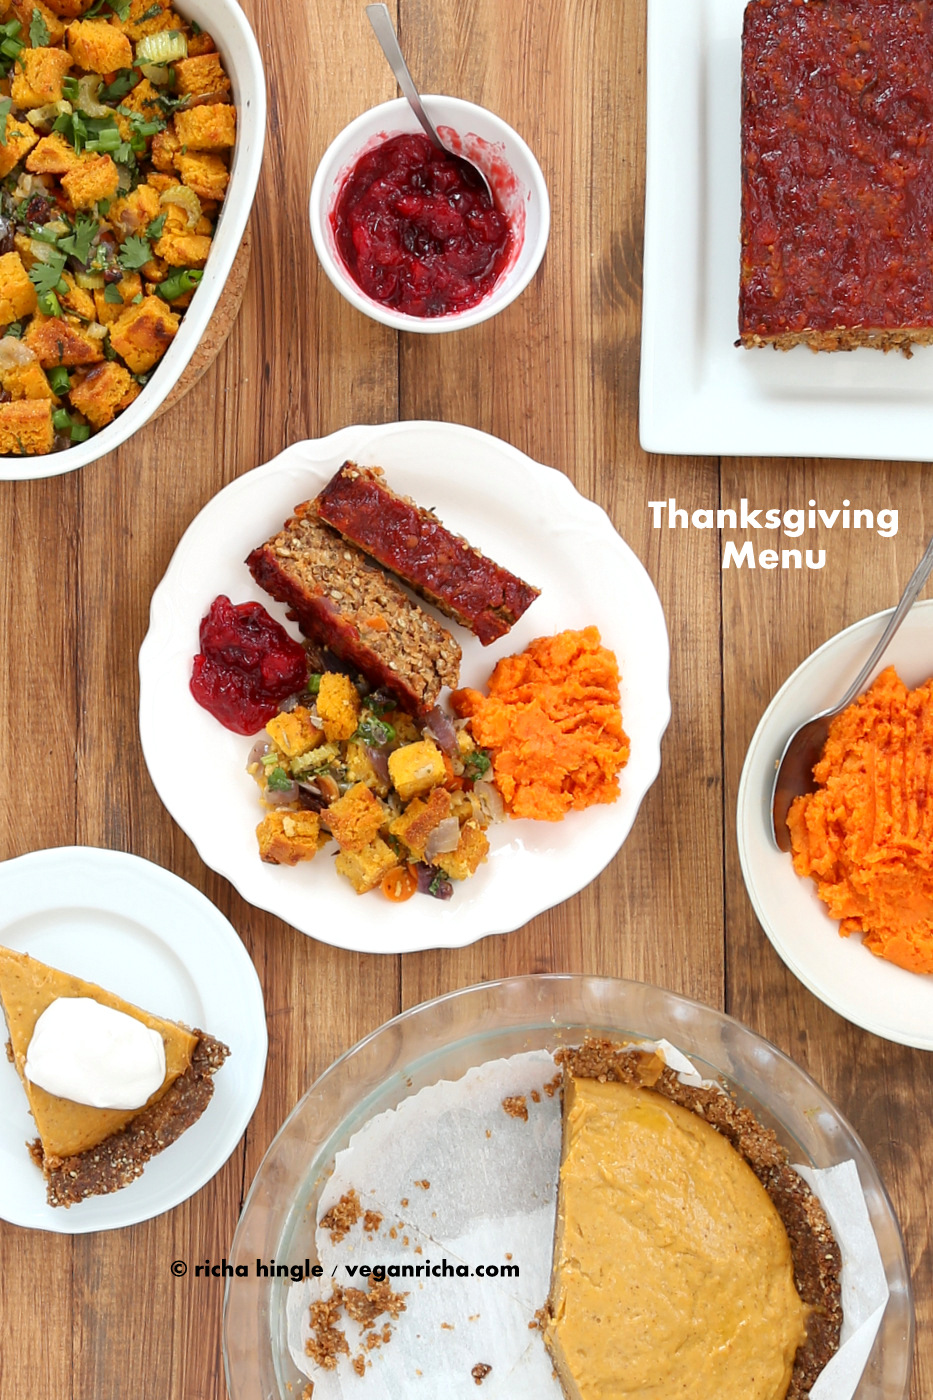 Vegan Thanksgiving Recipes 2014 | Vegan Richa